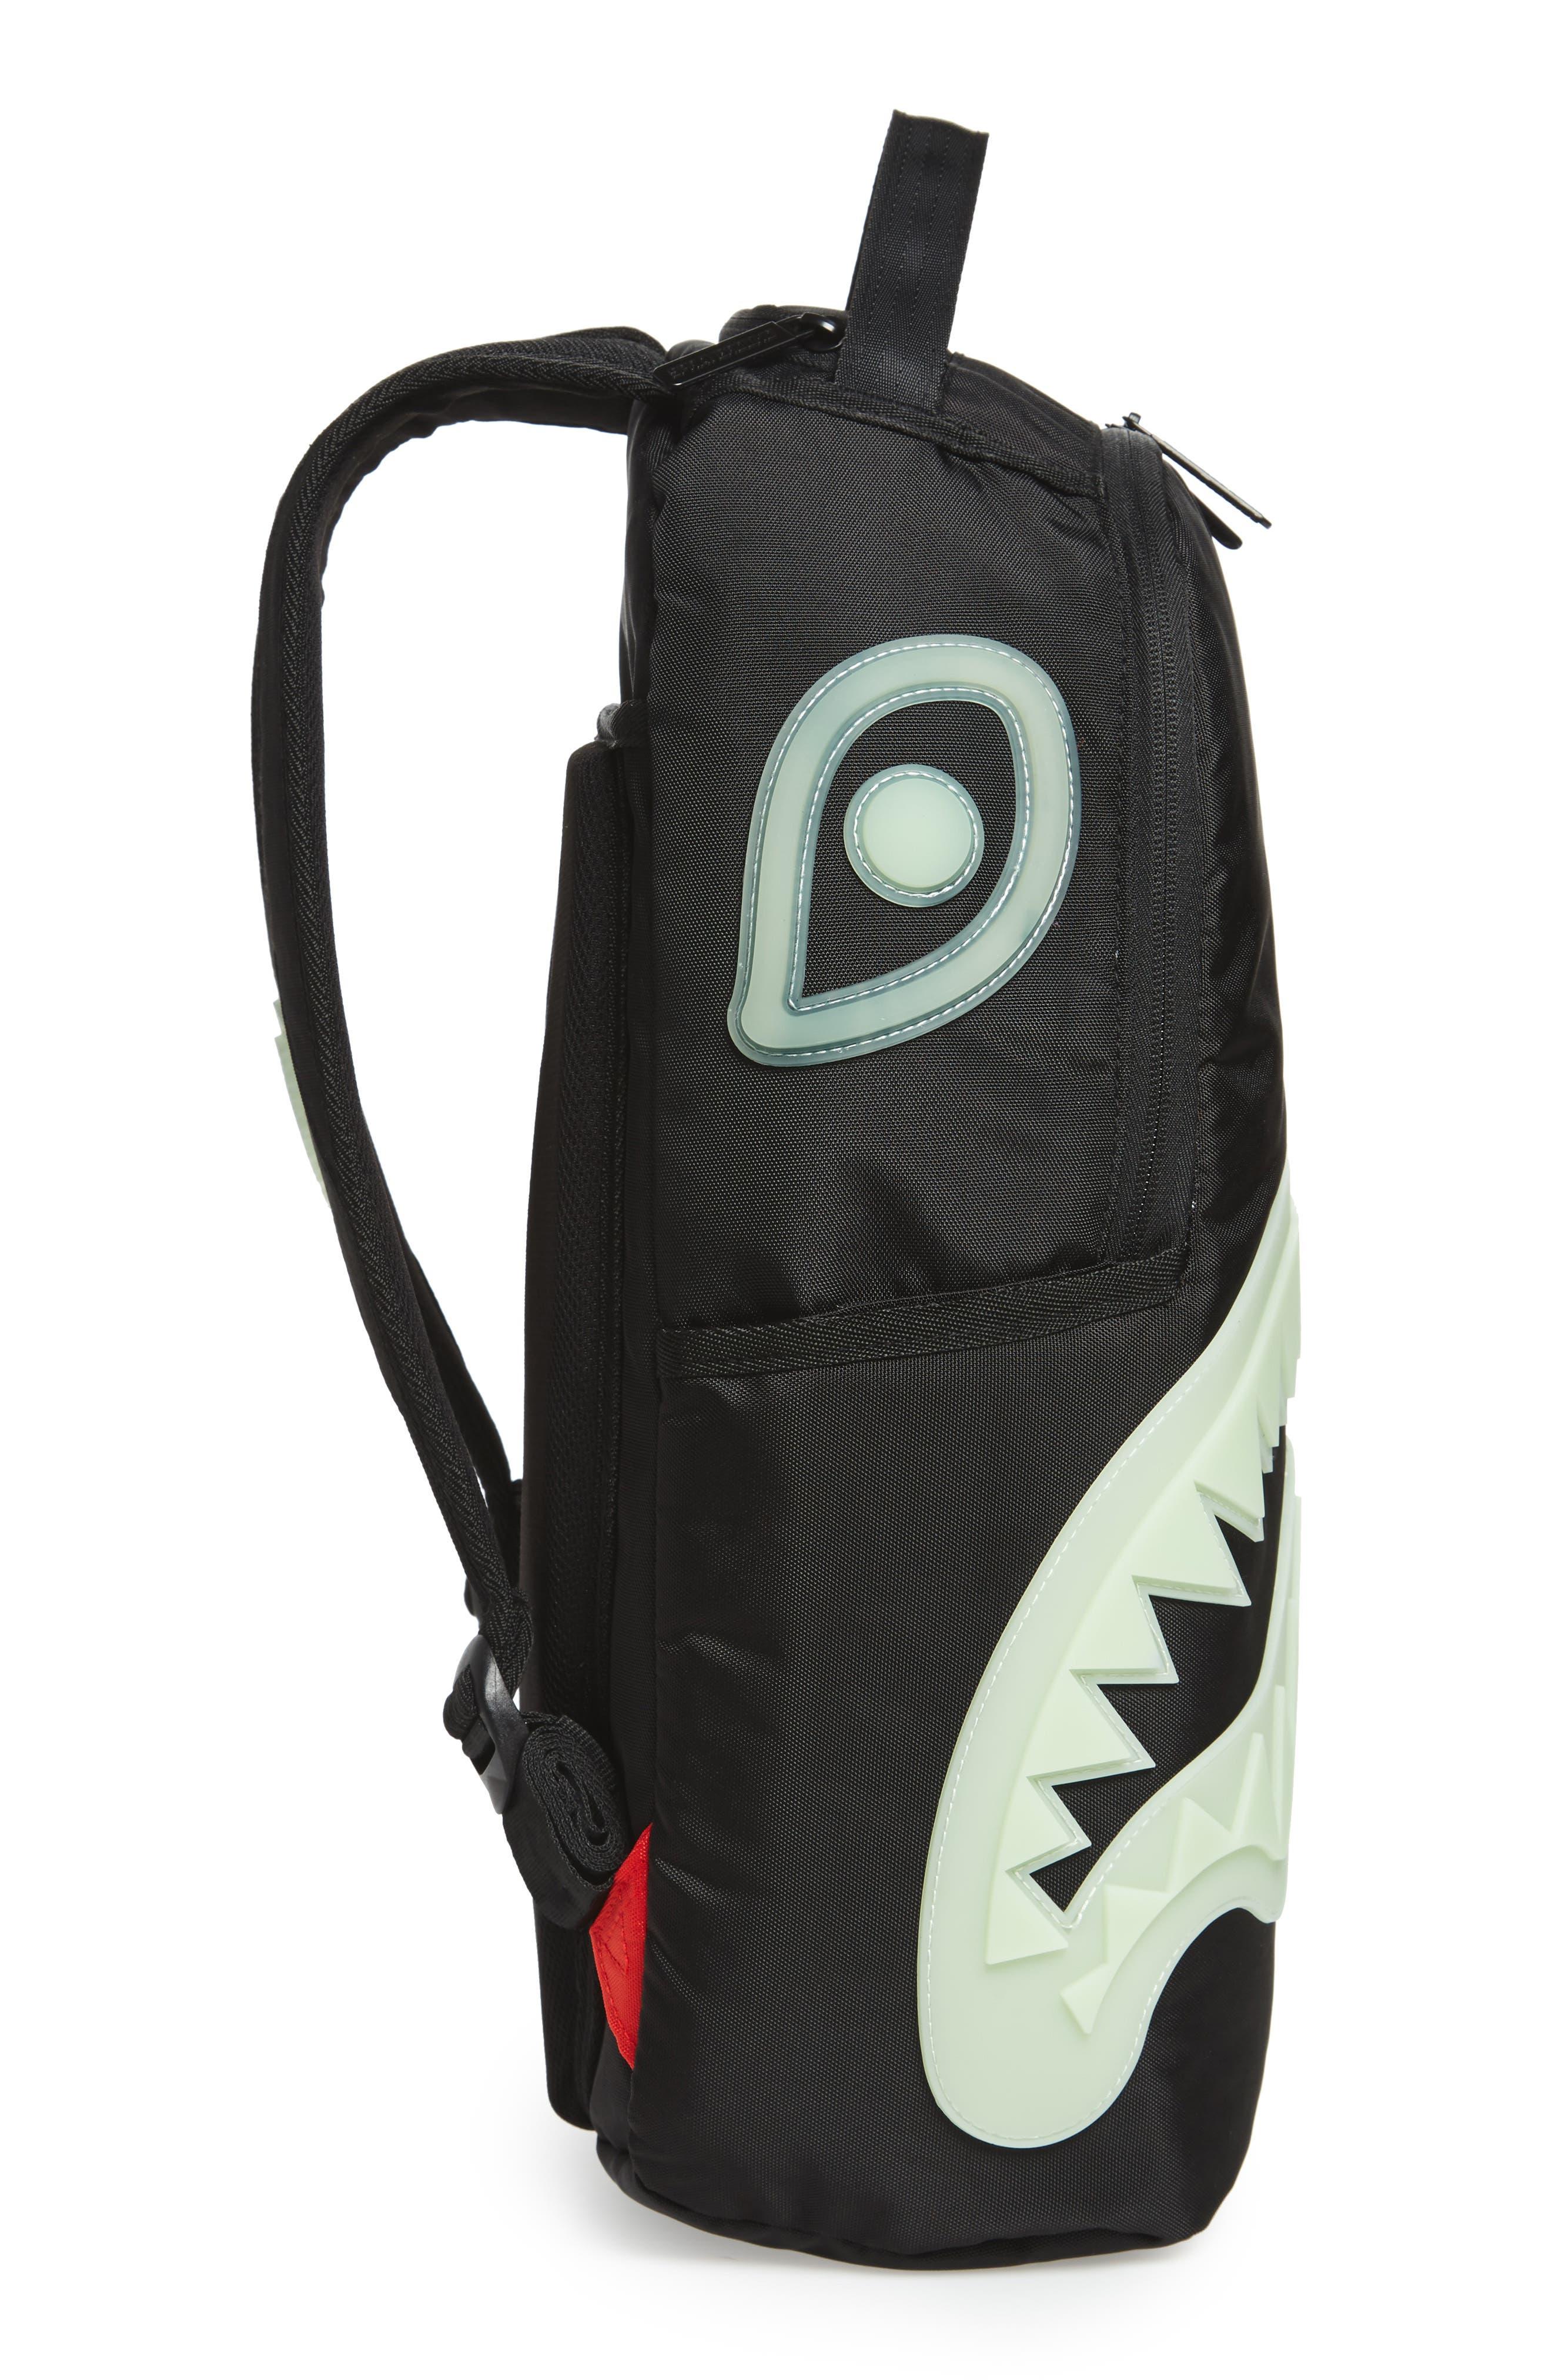 Glow in the Dark Shark Backpack,                             Alternate thumbnail 4, color,                             001